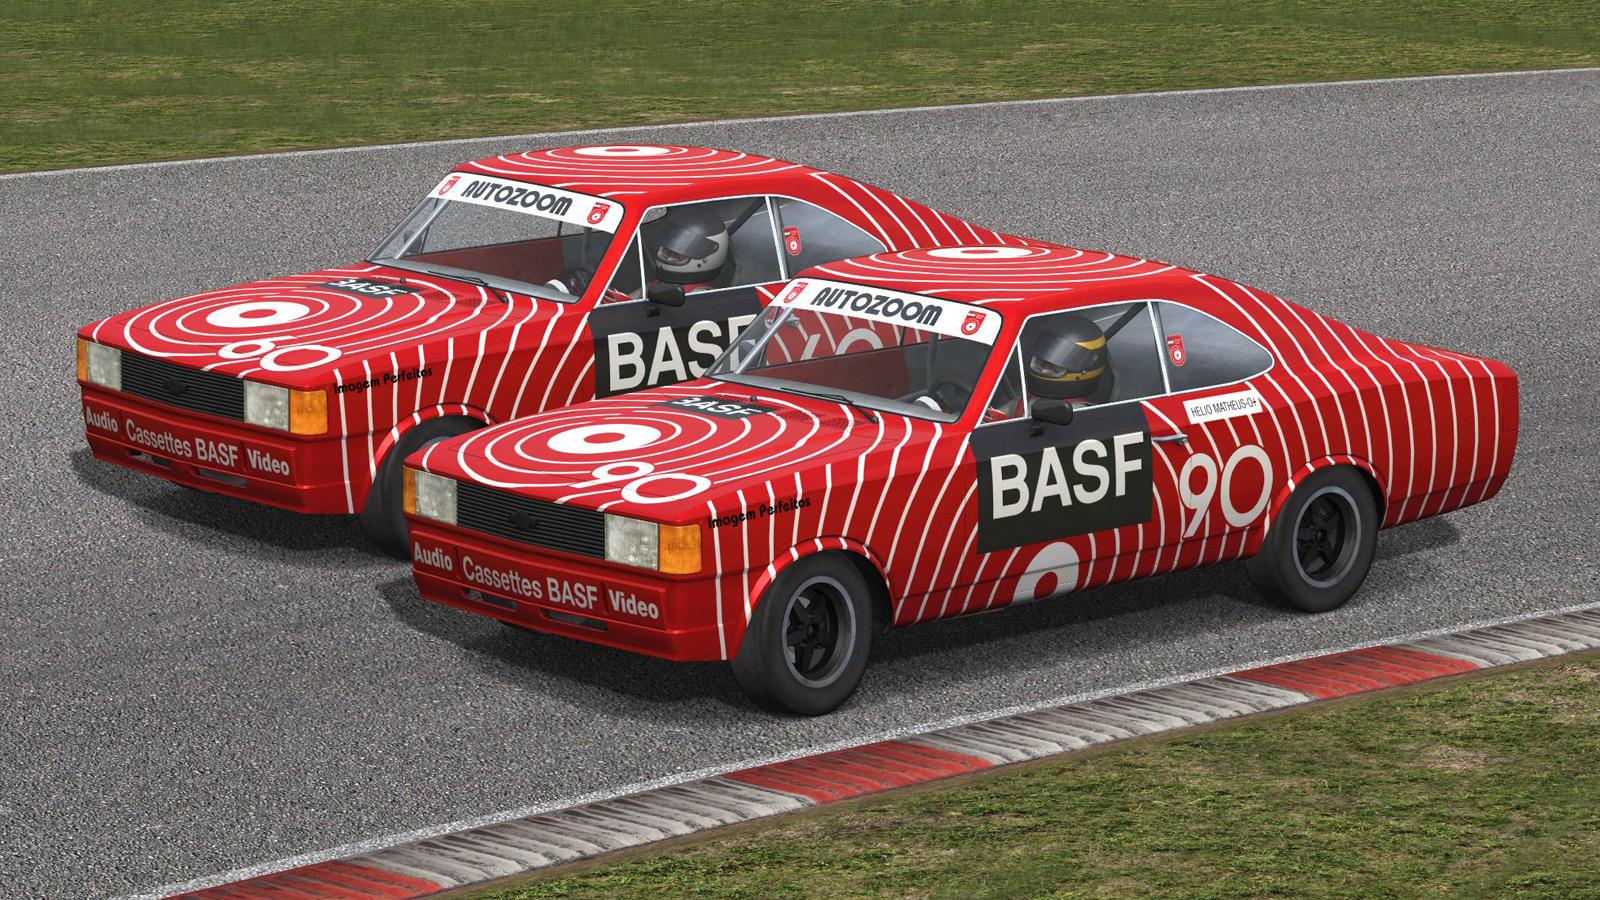 Basf Race Car Sponsorship